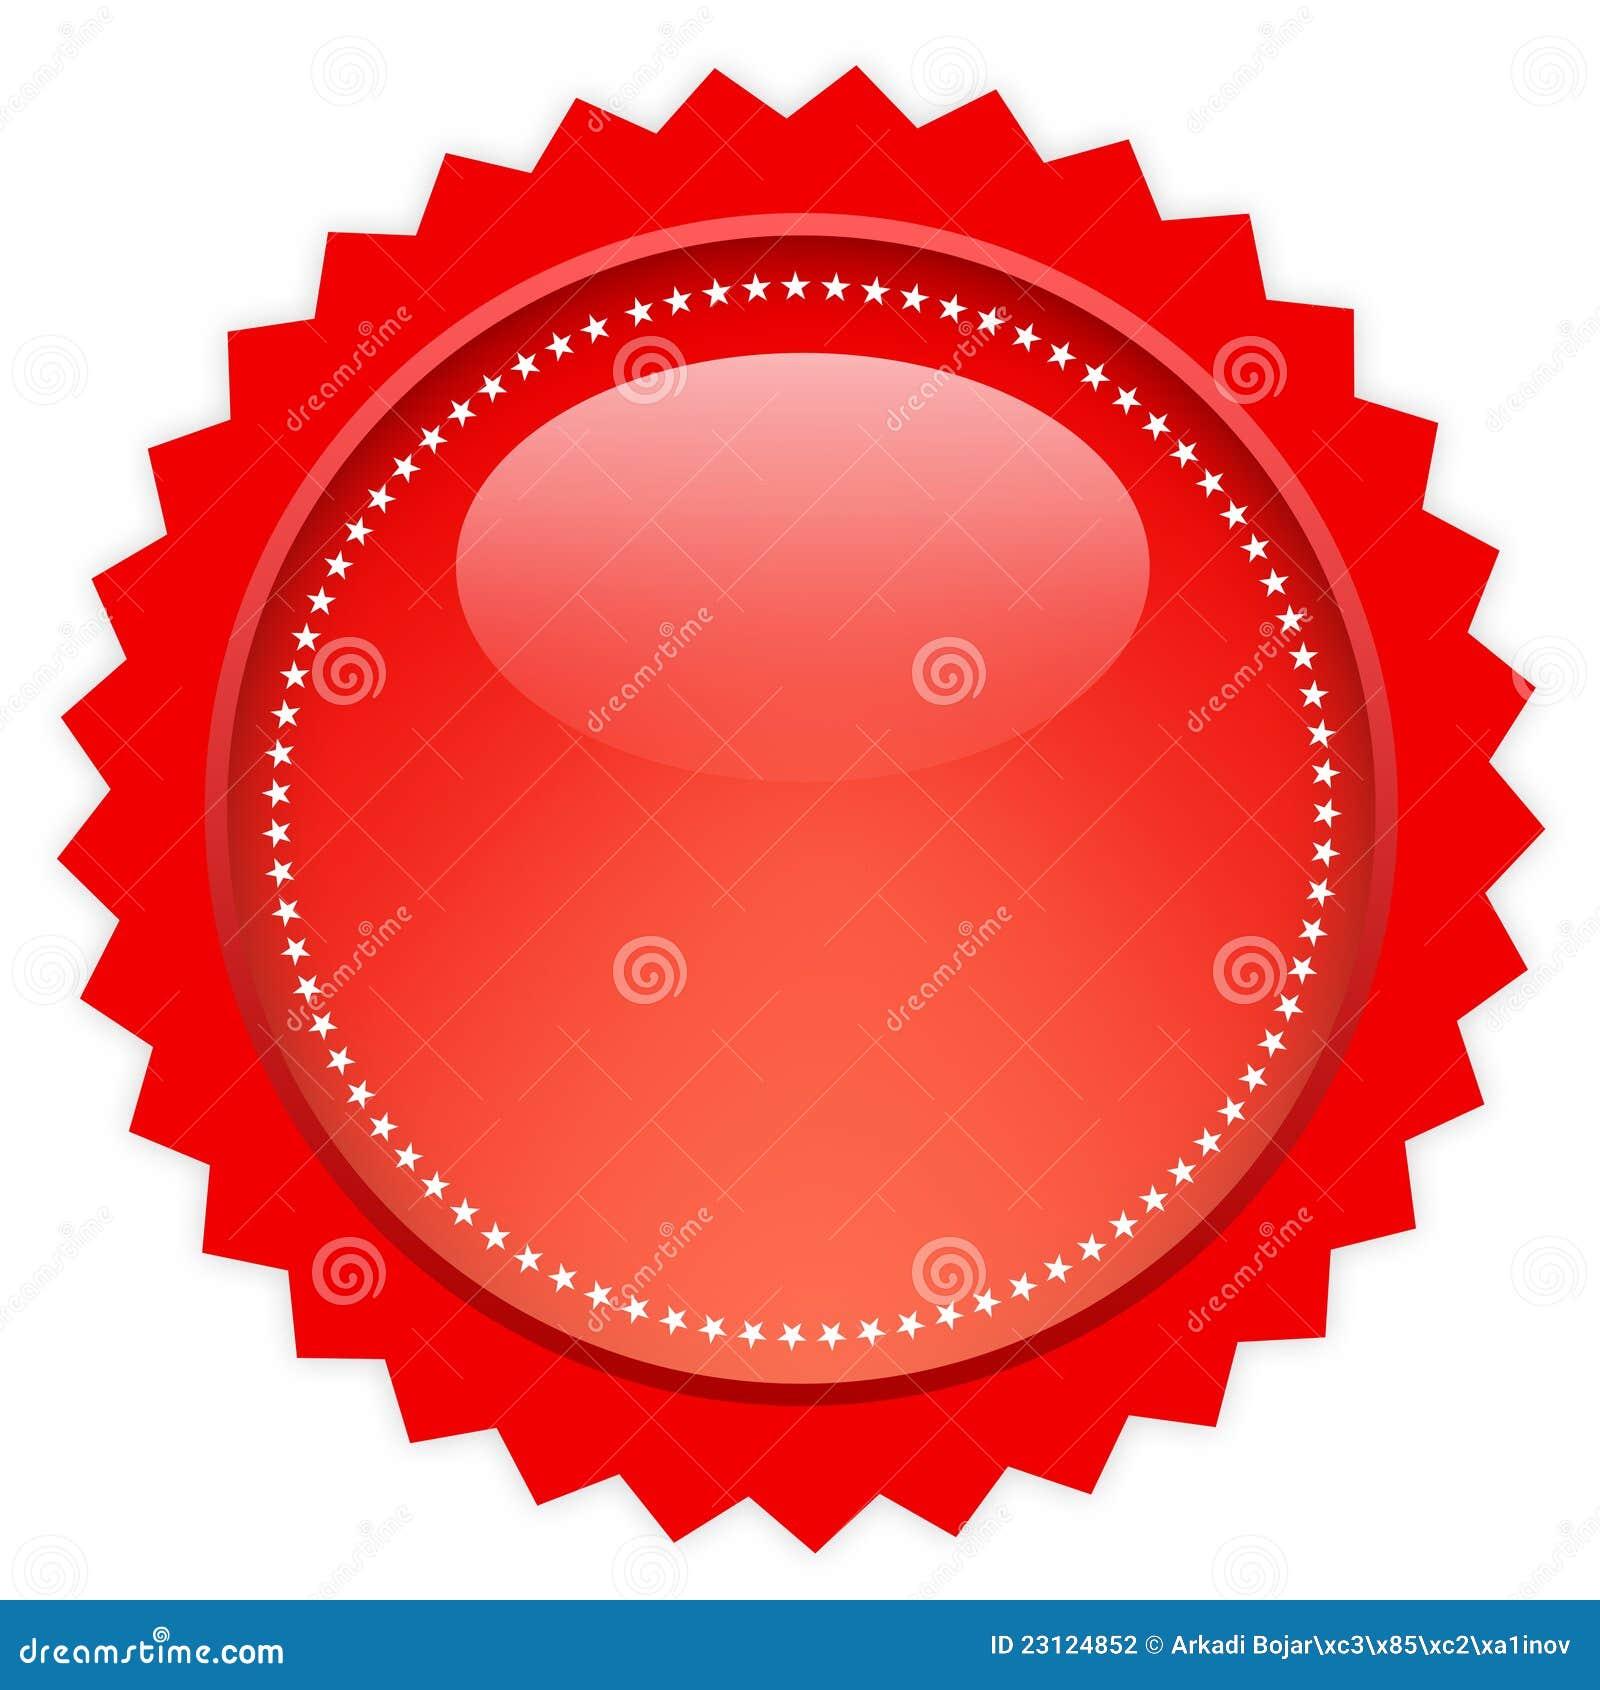 red glass price tag stock illustration  illustration of